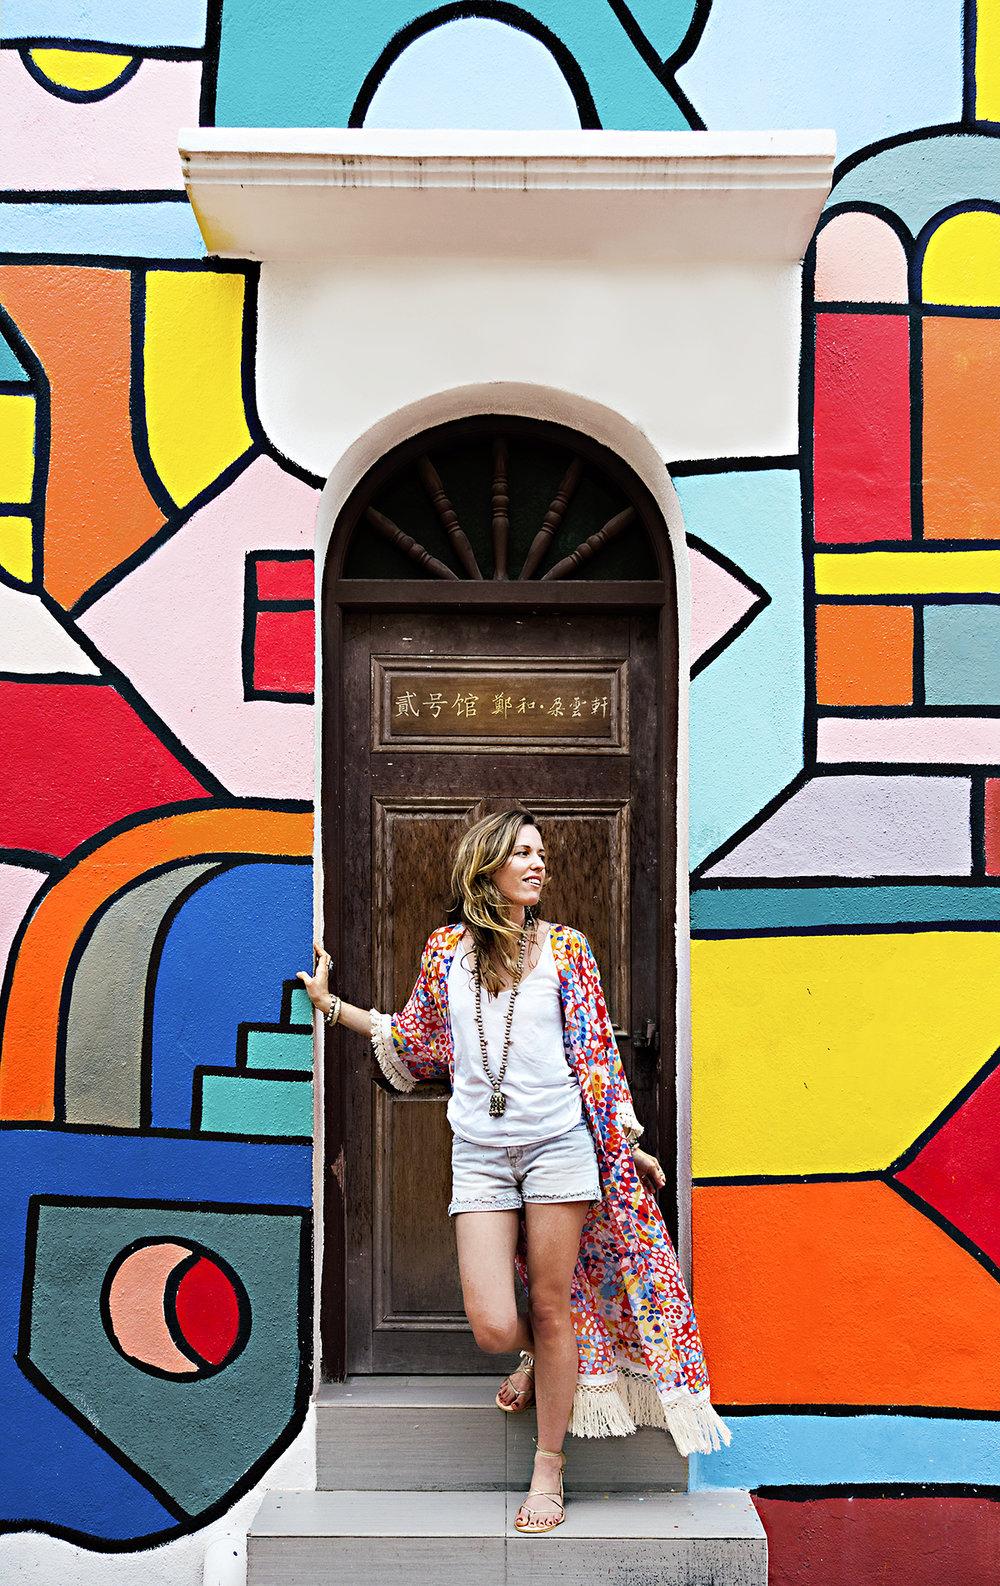 Heidi_Hibberd_Circus_Kimono_Melaka_Streetart